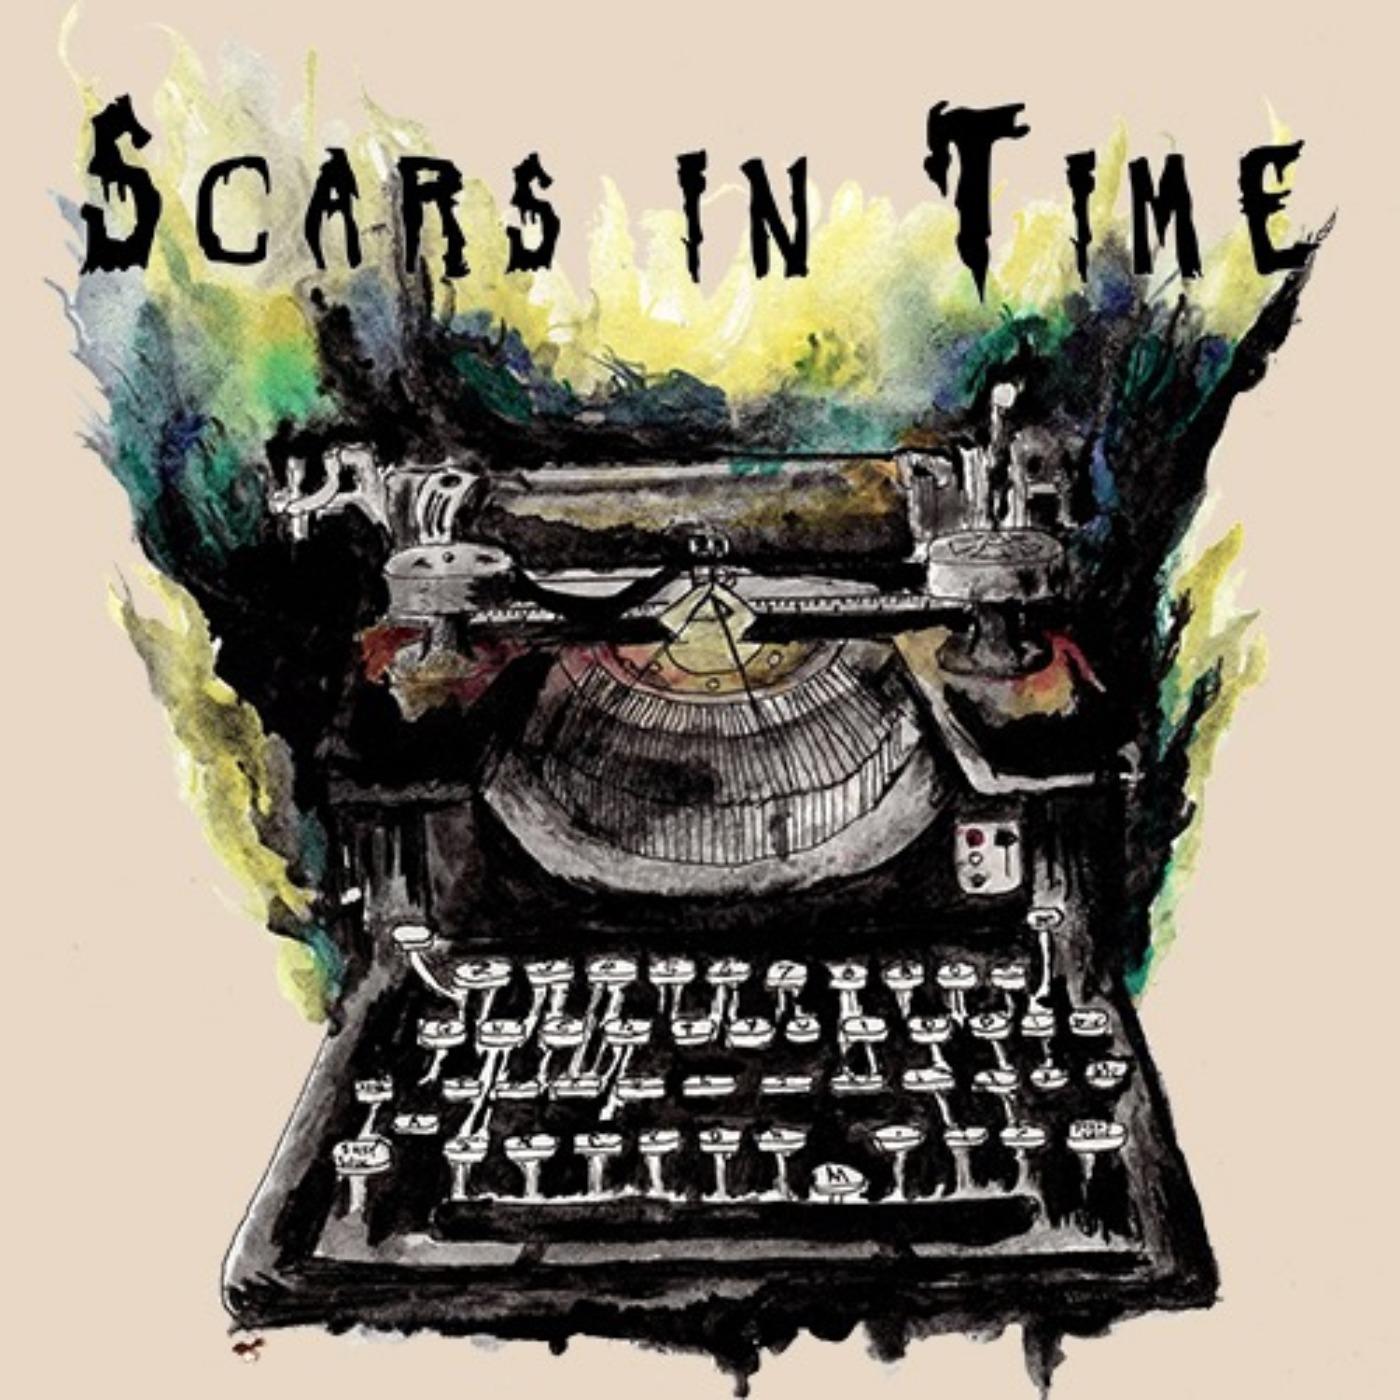 Introducing Season Five: Scars in Time